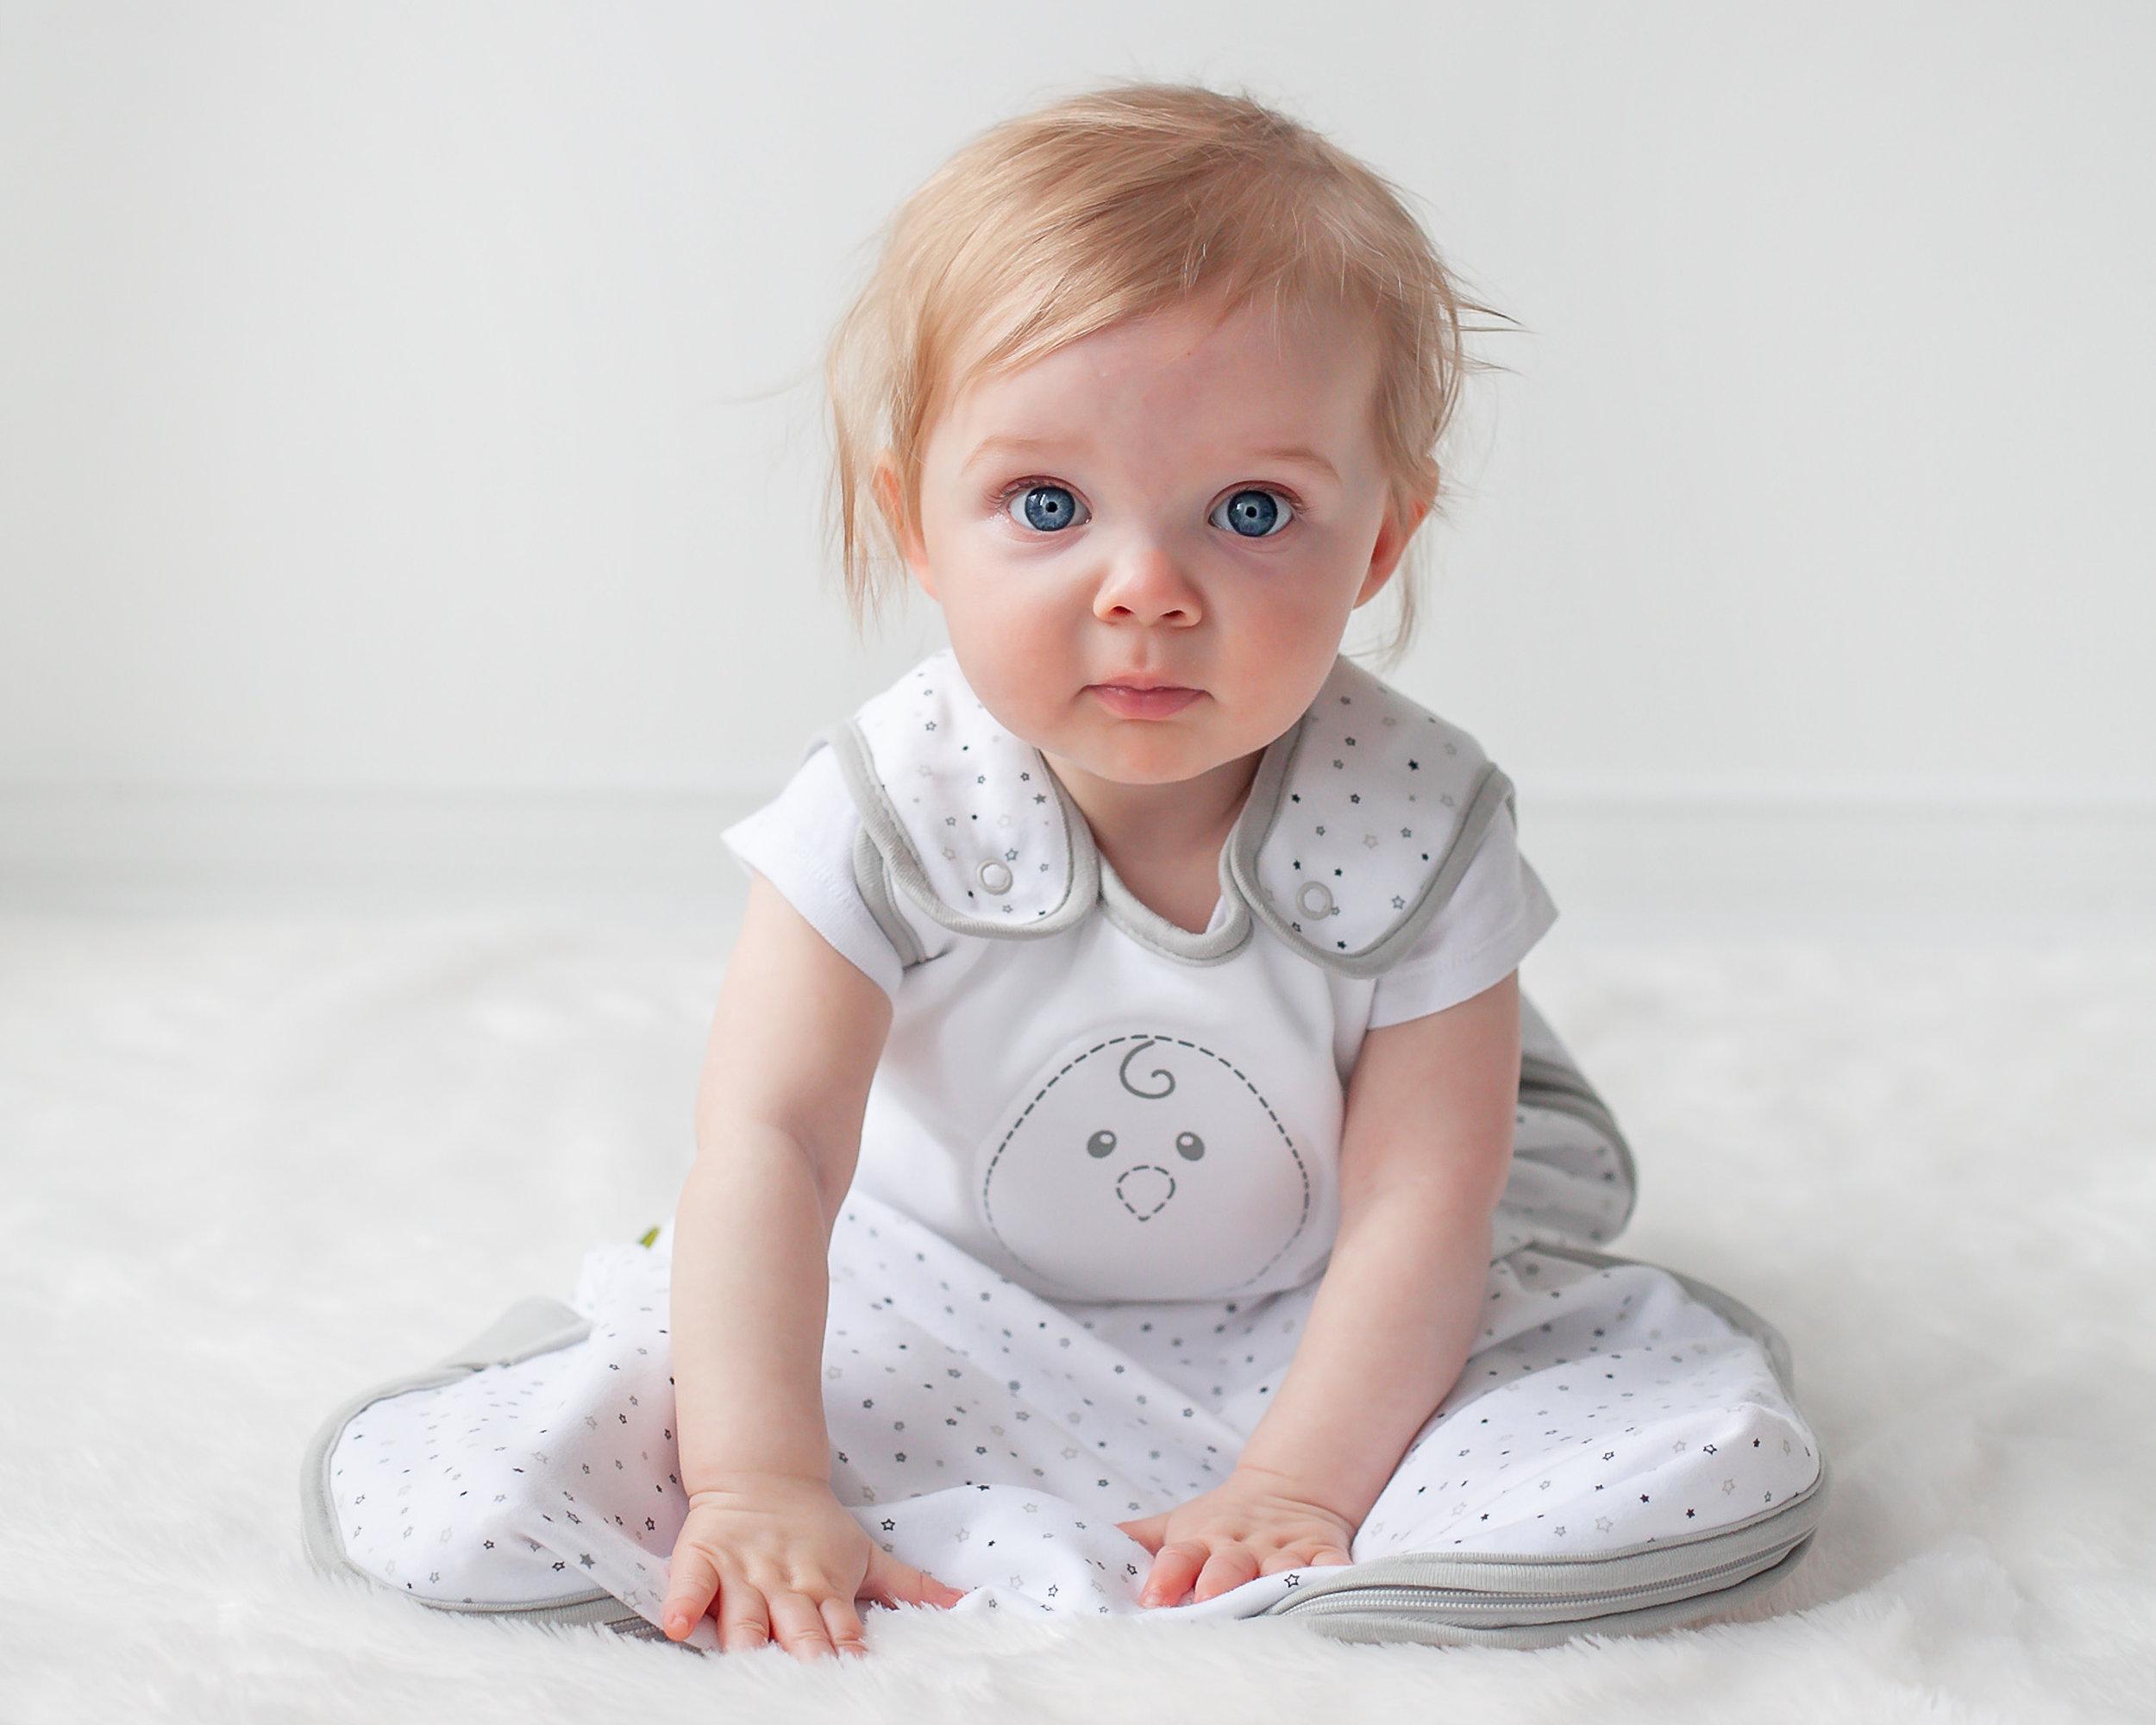 Branding_Photographer_ Toronto_Oshawa_Baby_Product_Petra_King_Photography